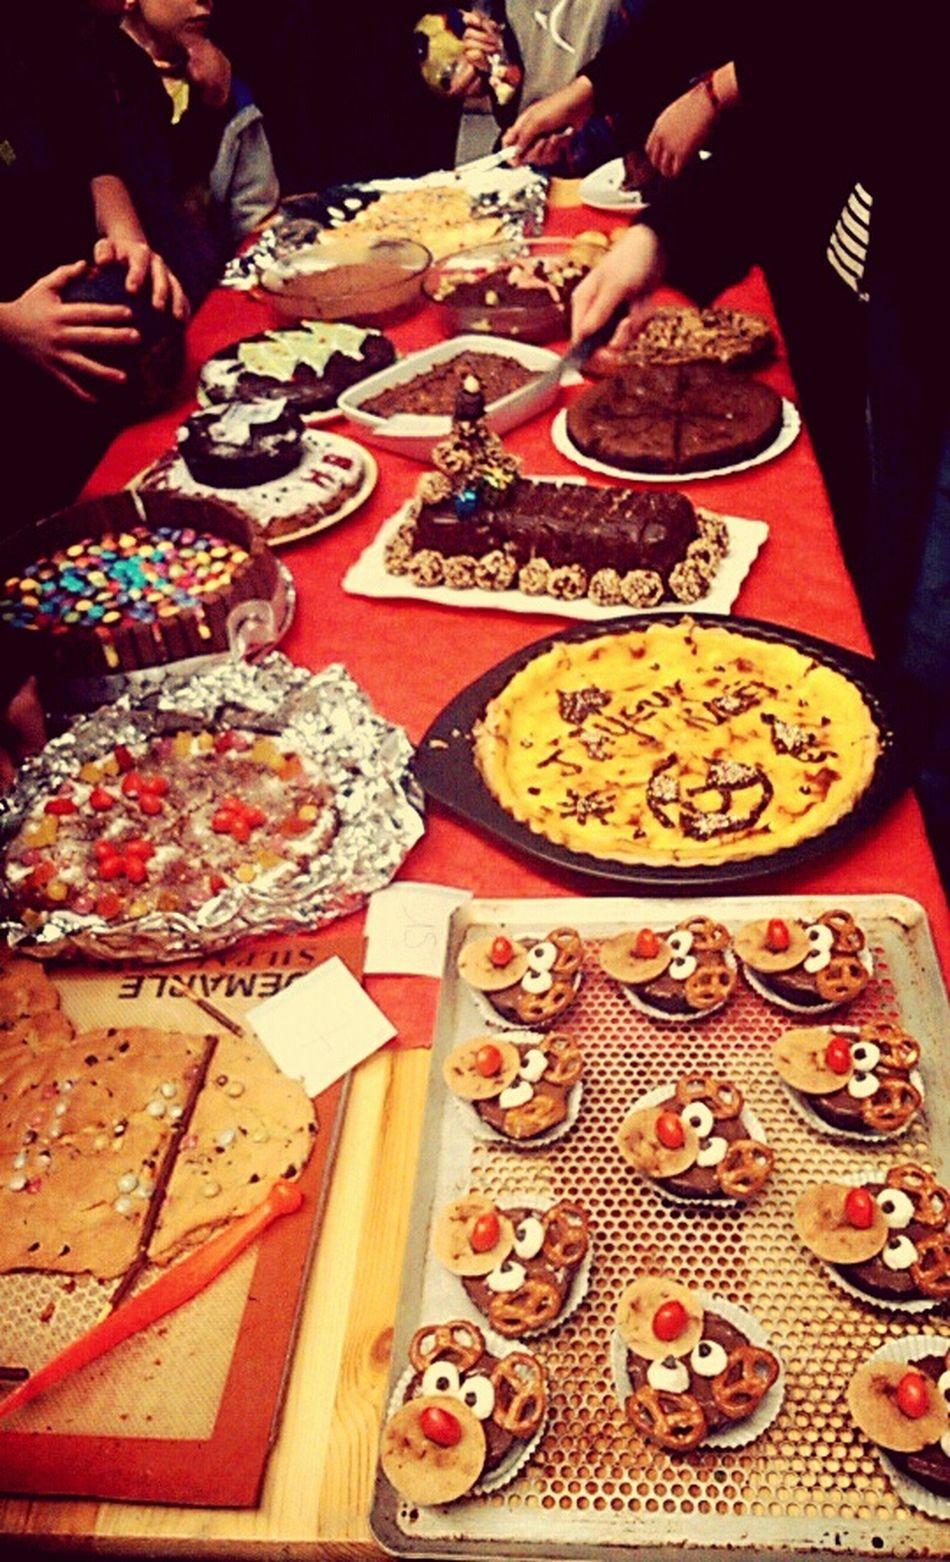 Merry Chrismas ! Noël a la vitréenne ⛄ Birthday And Chrismas Cake